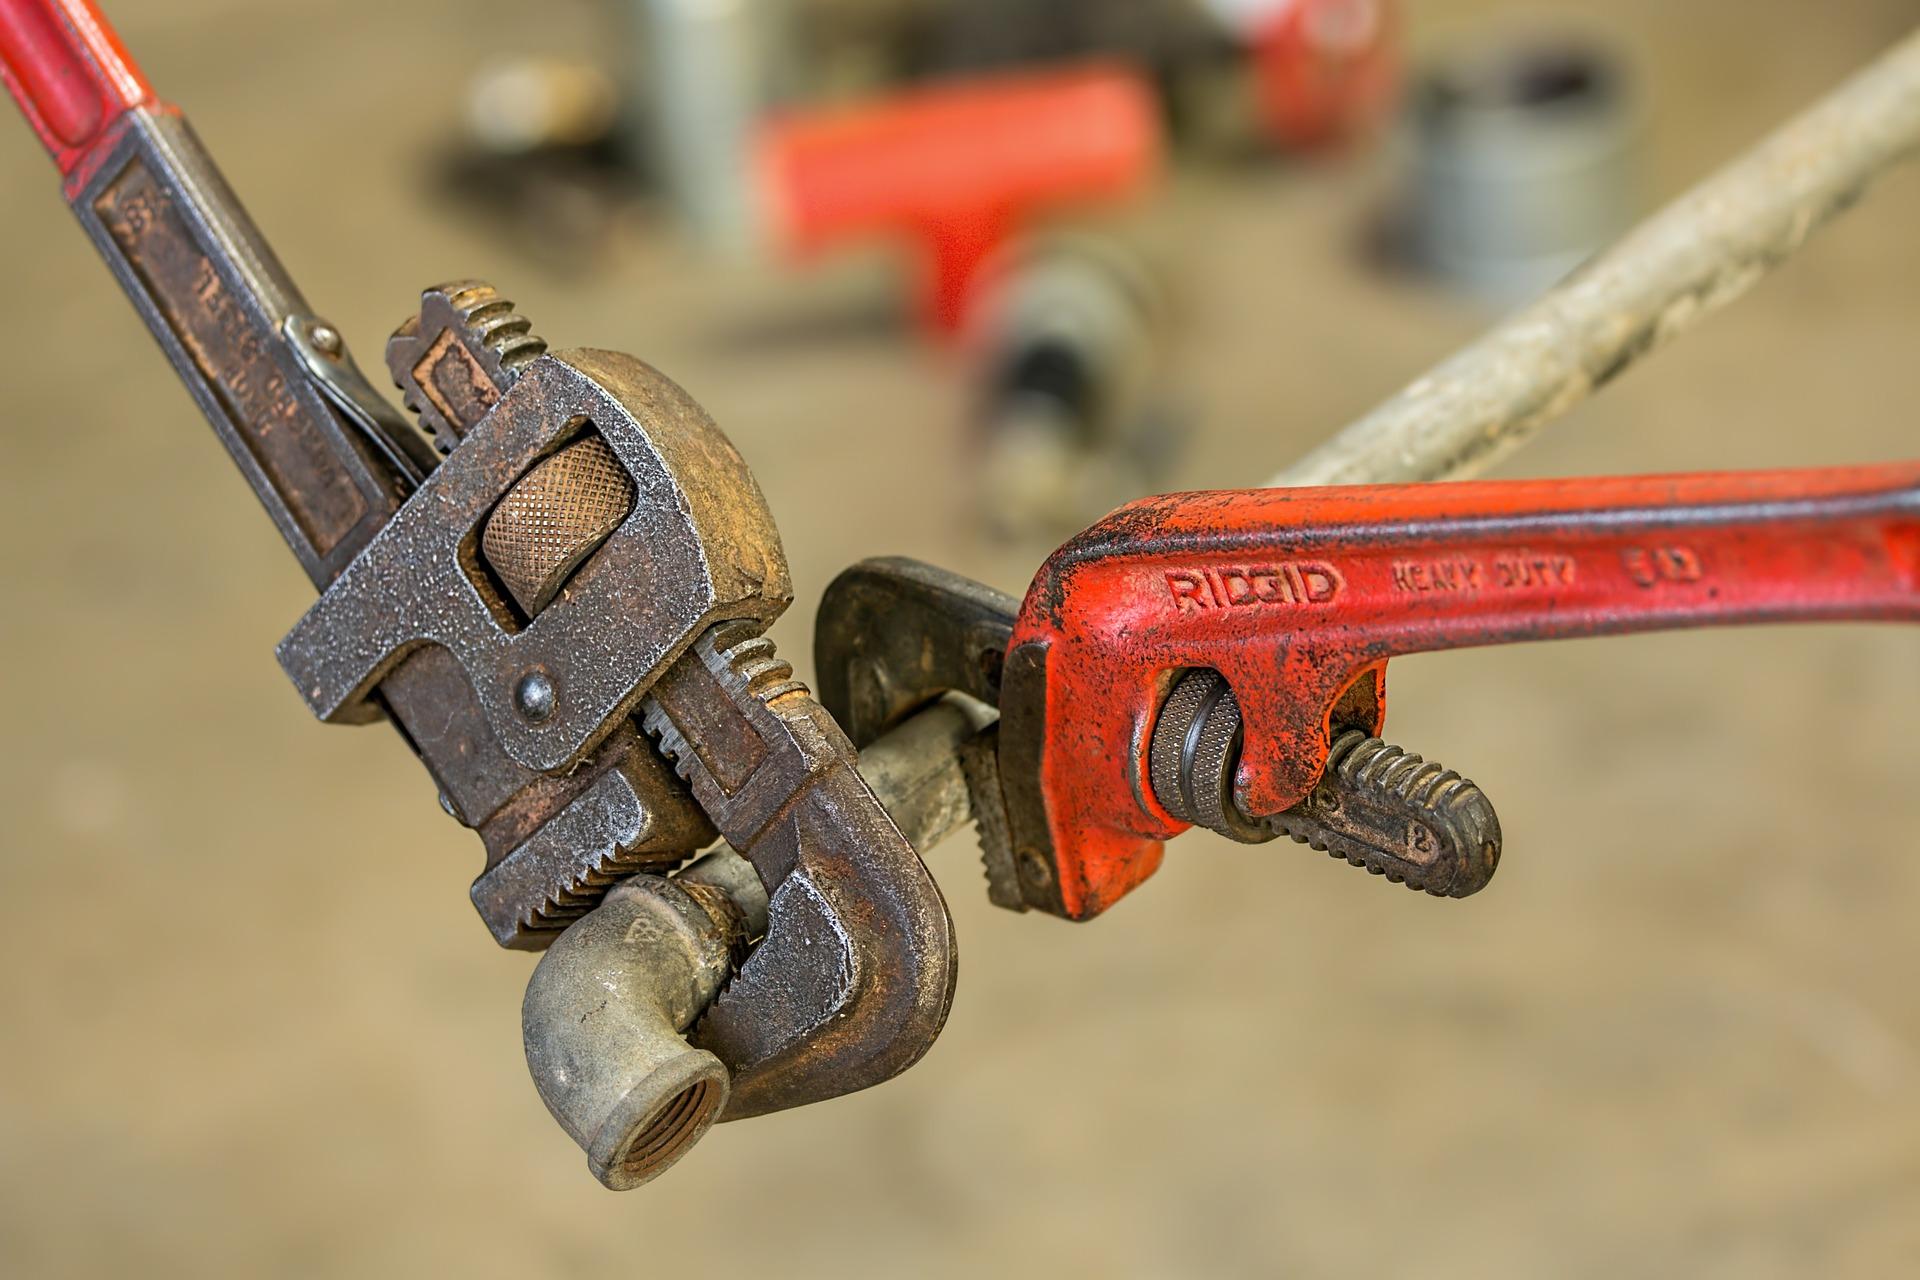 New Employees - O'Haver Plumbing is always hiring licensed plumbers. We send apprentice plumbers to a DoL sanctioned apprenticeship school.